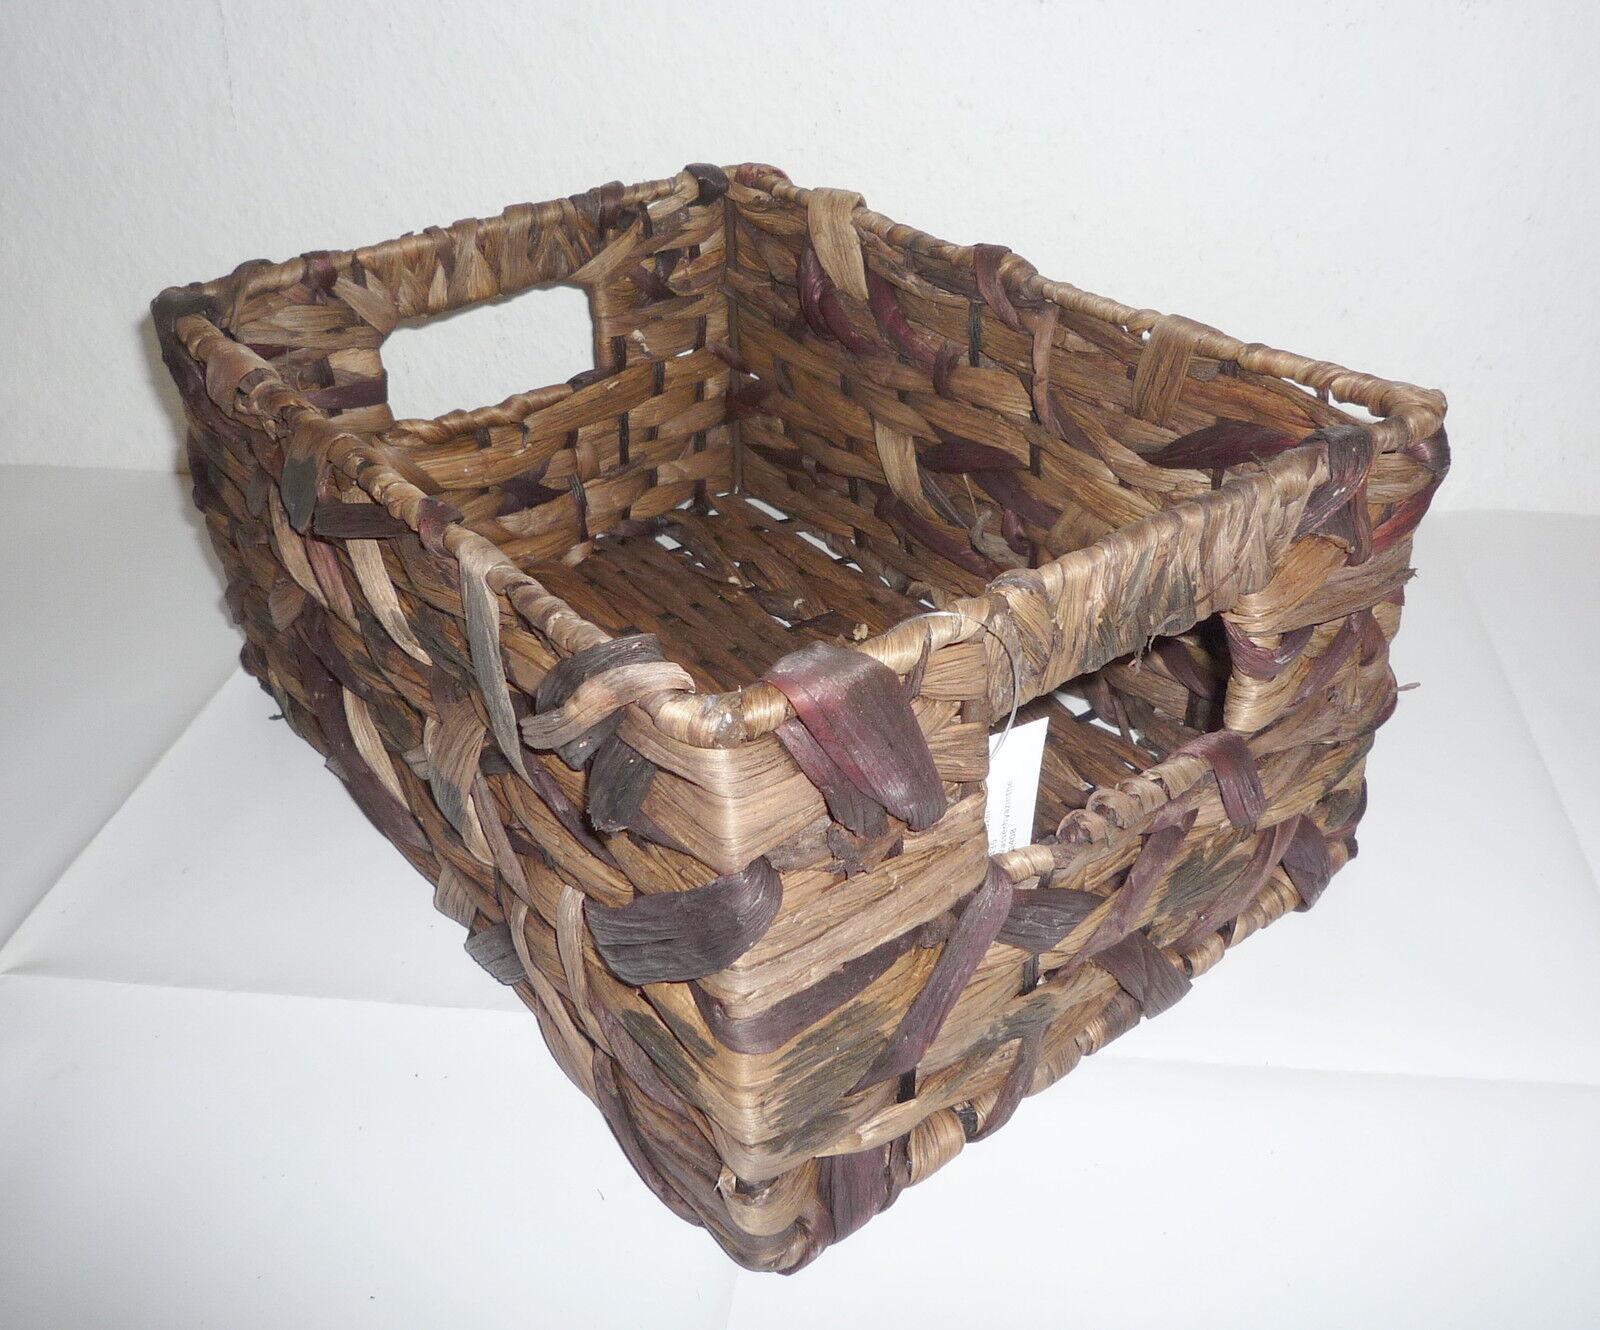 deko korb set 3 tlg dunkelbraun aus wasserhyazinthe aufbewahrungskorb neu ovp ebay. Black Bedroom Furniture Sets. Home Design Ideas